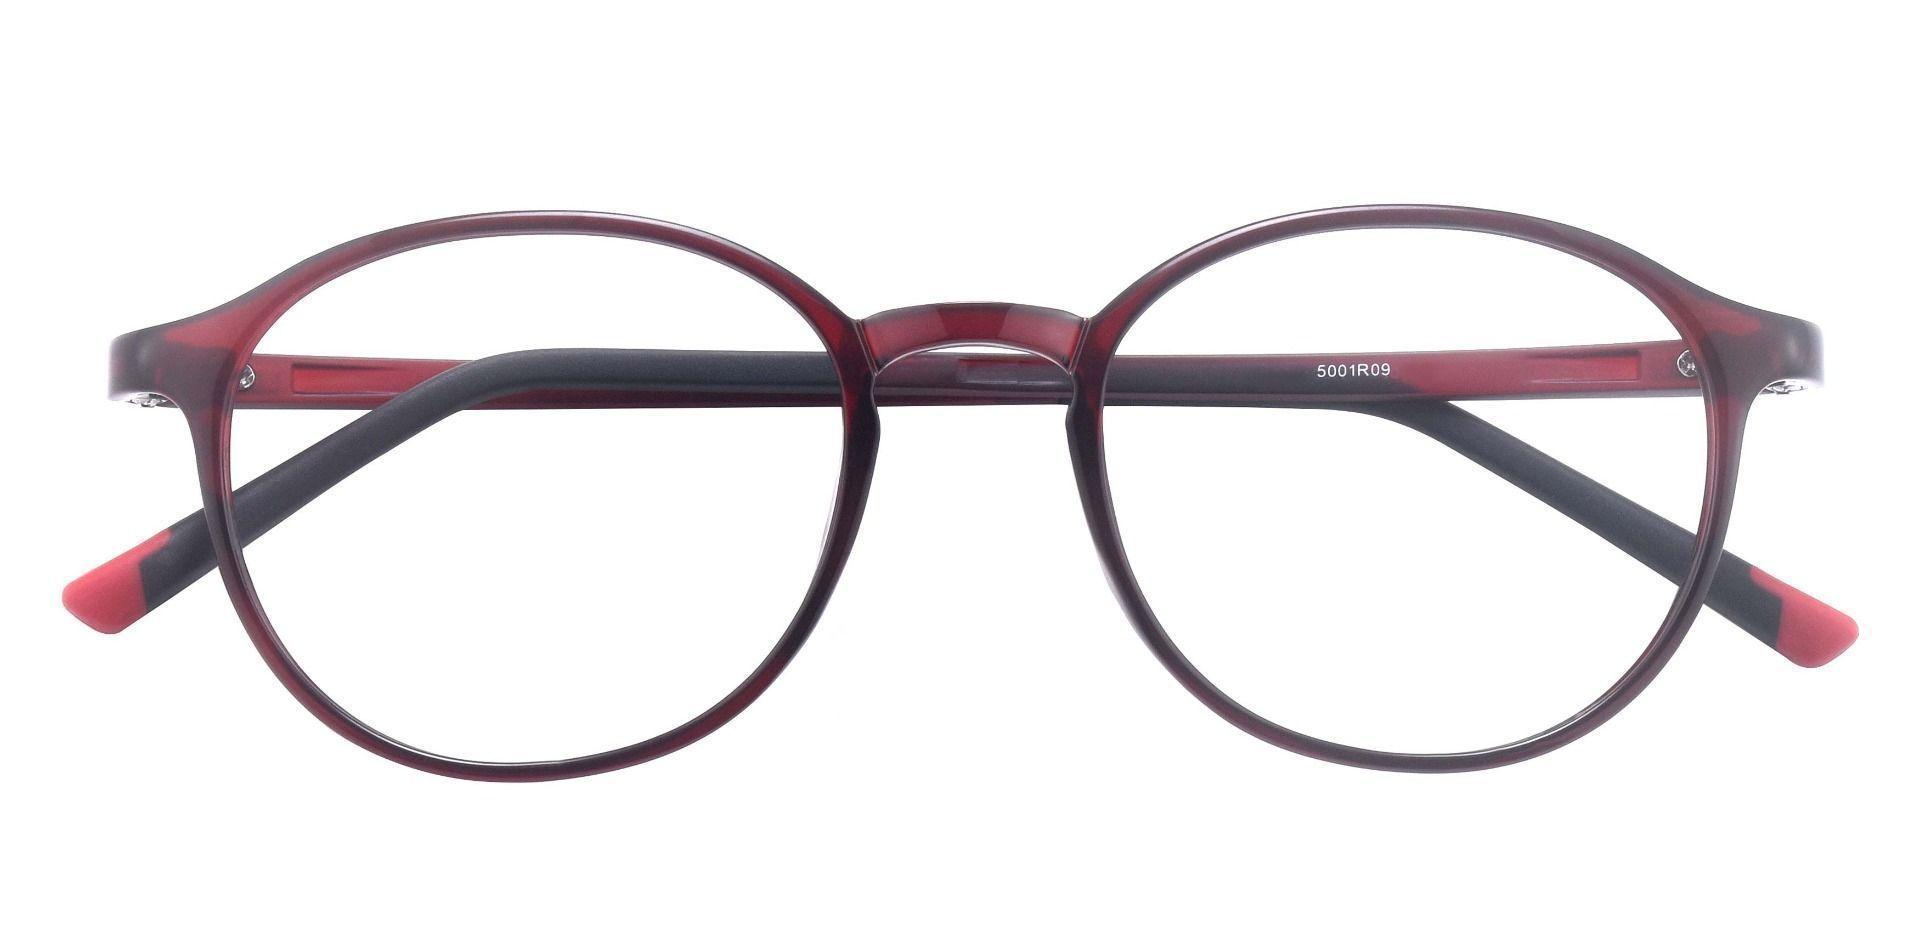 Agave Oval Blue Light Blocking Glasses - Mahogany